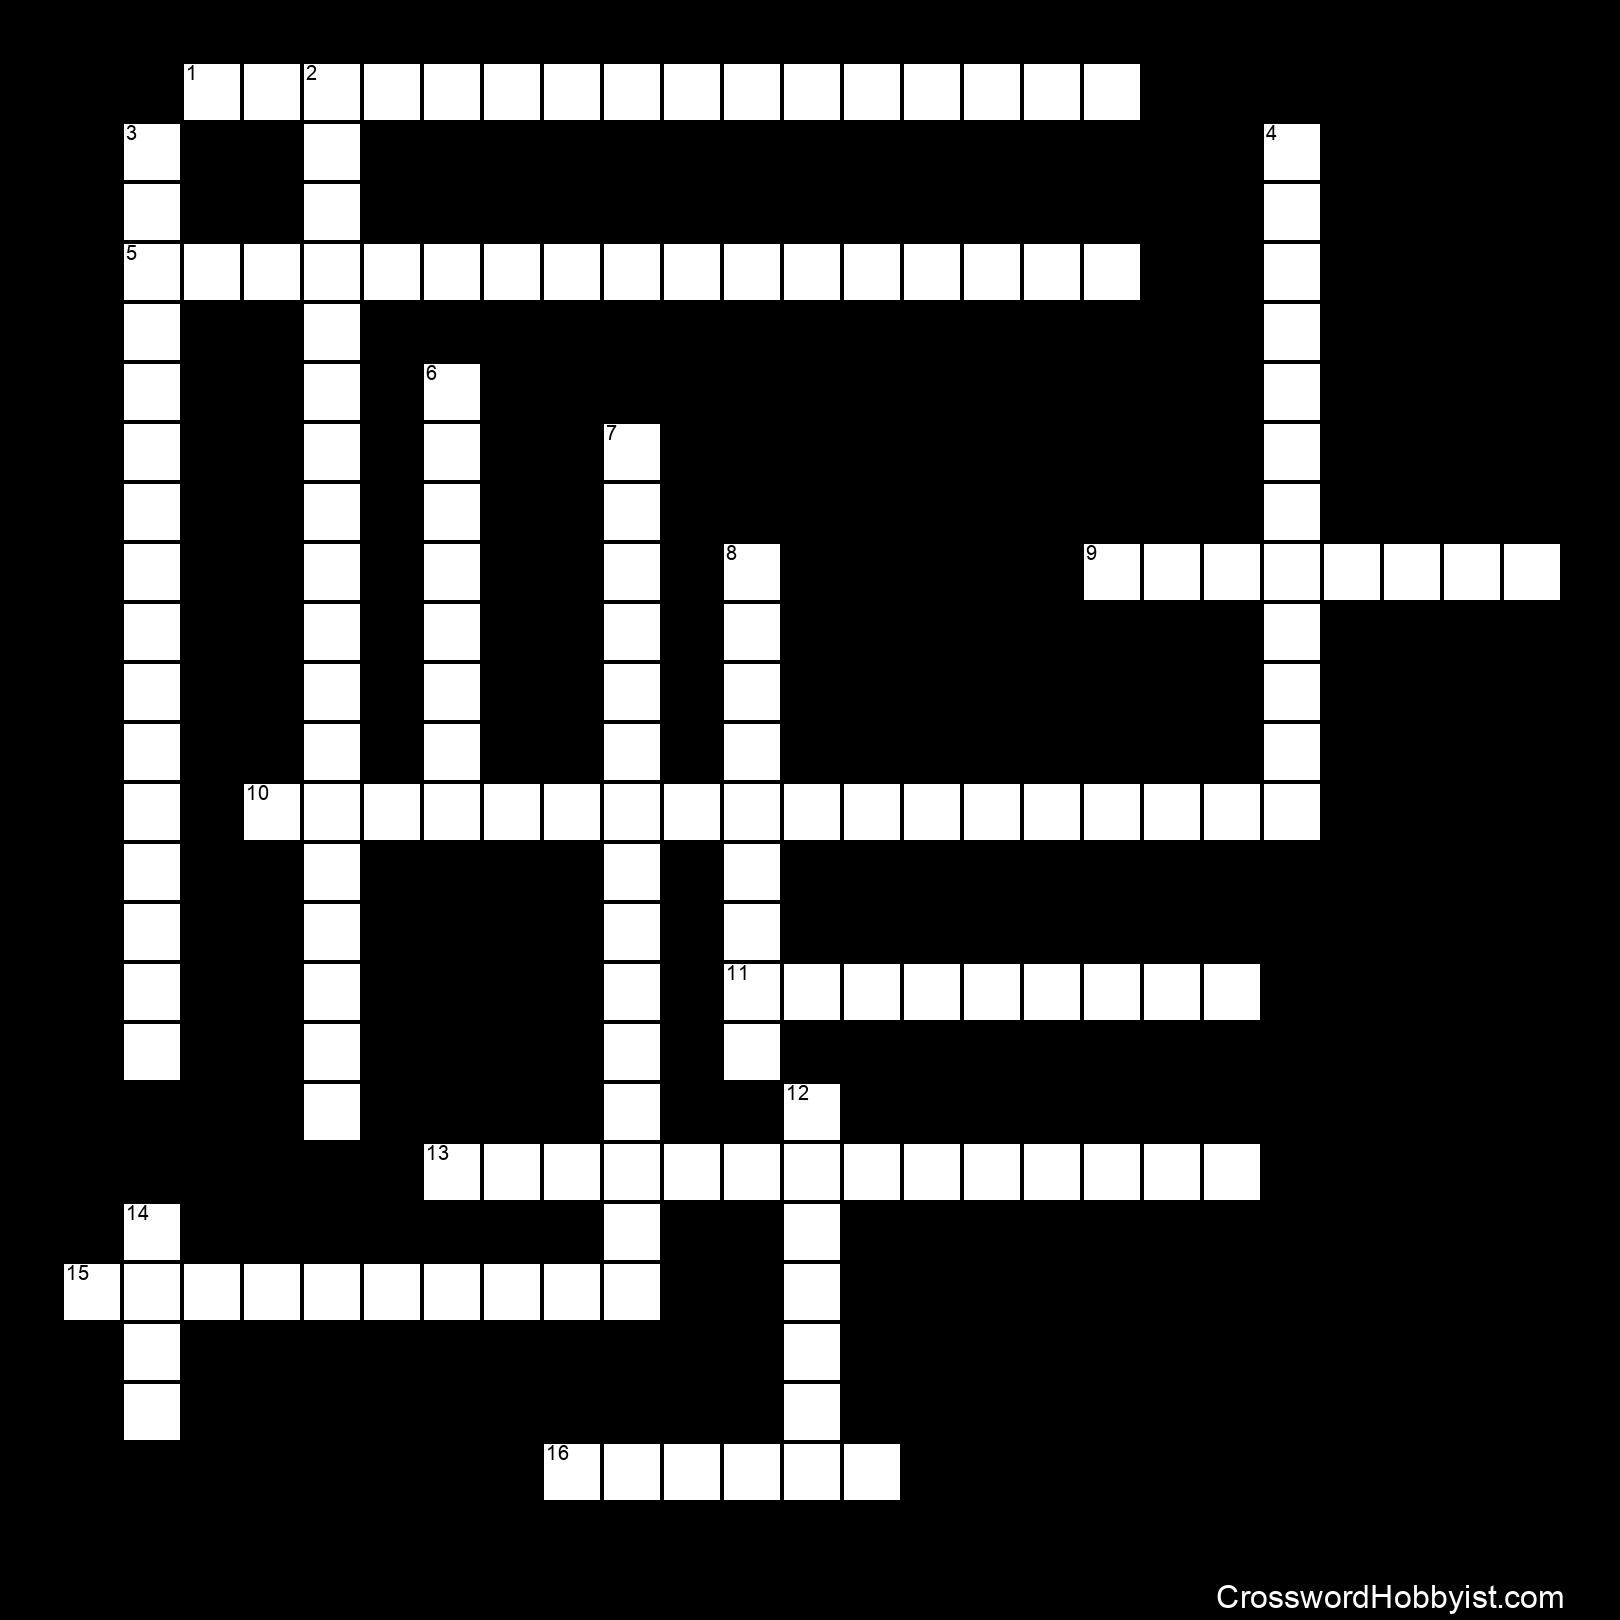 action legal document crossword clue